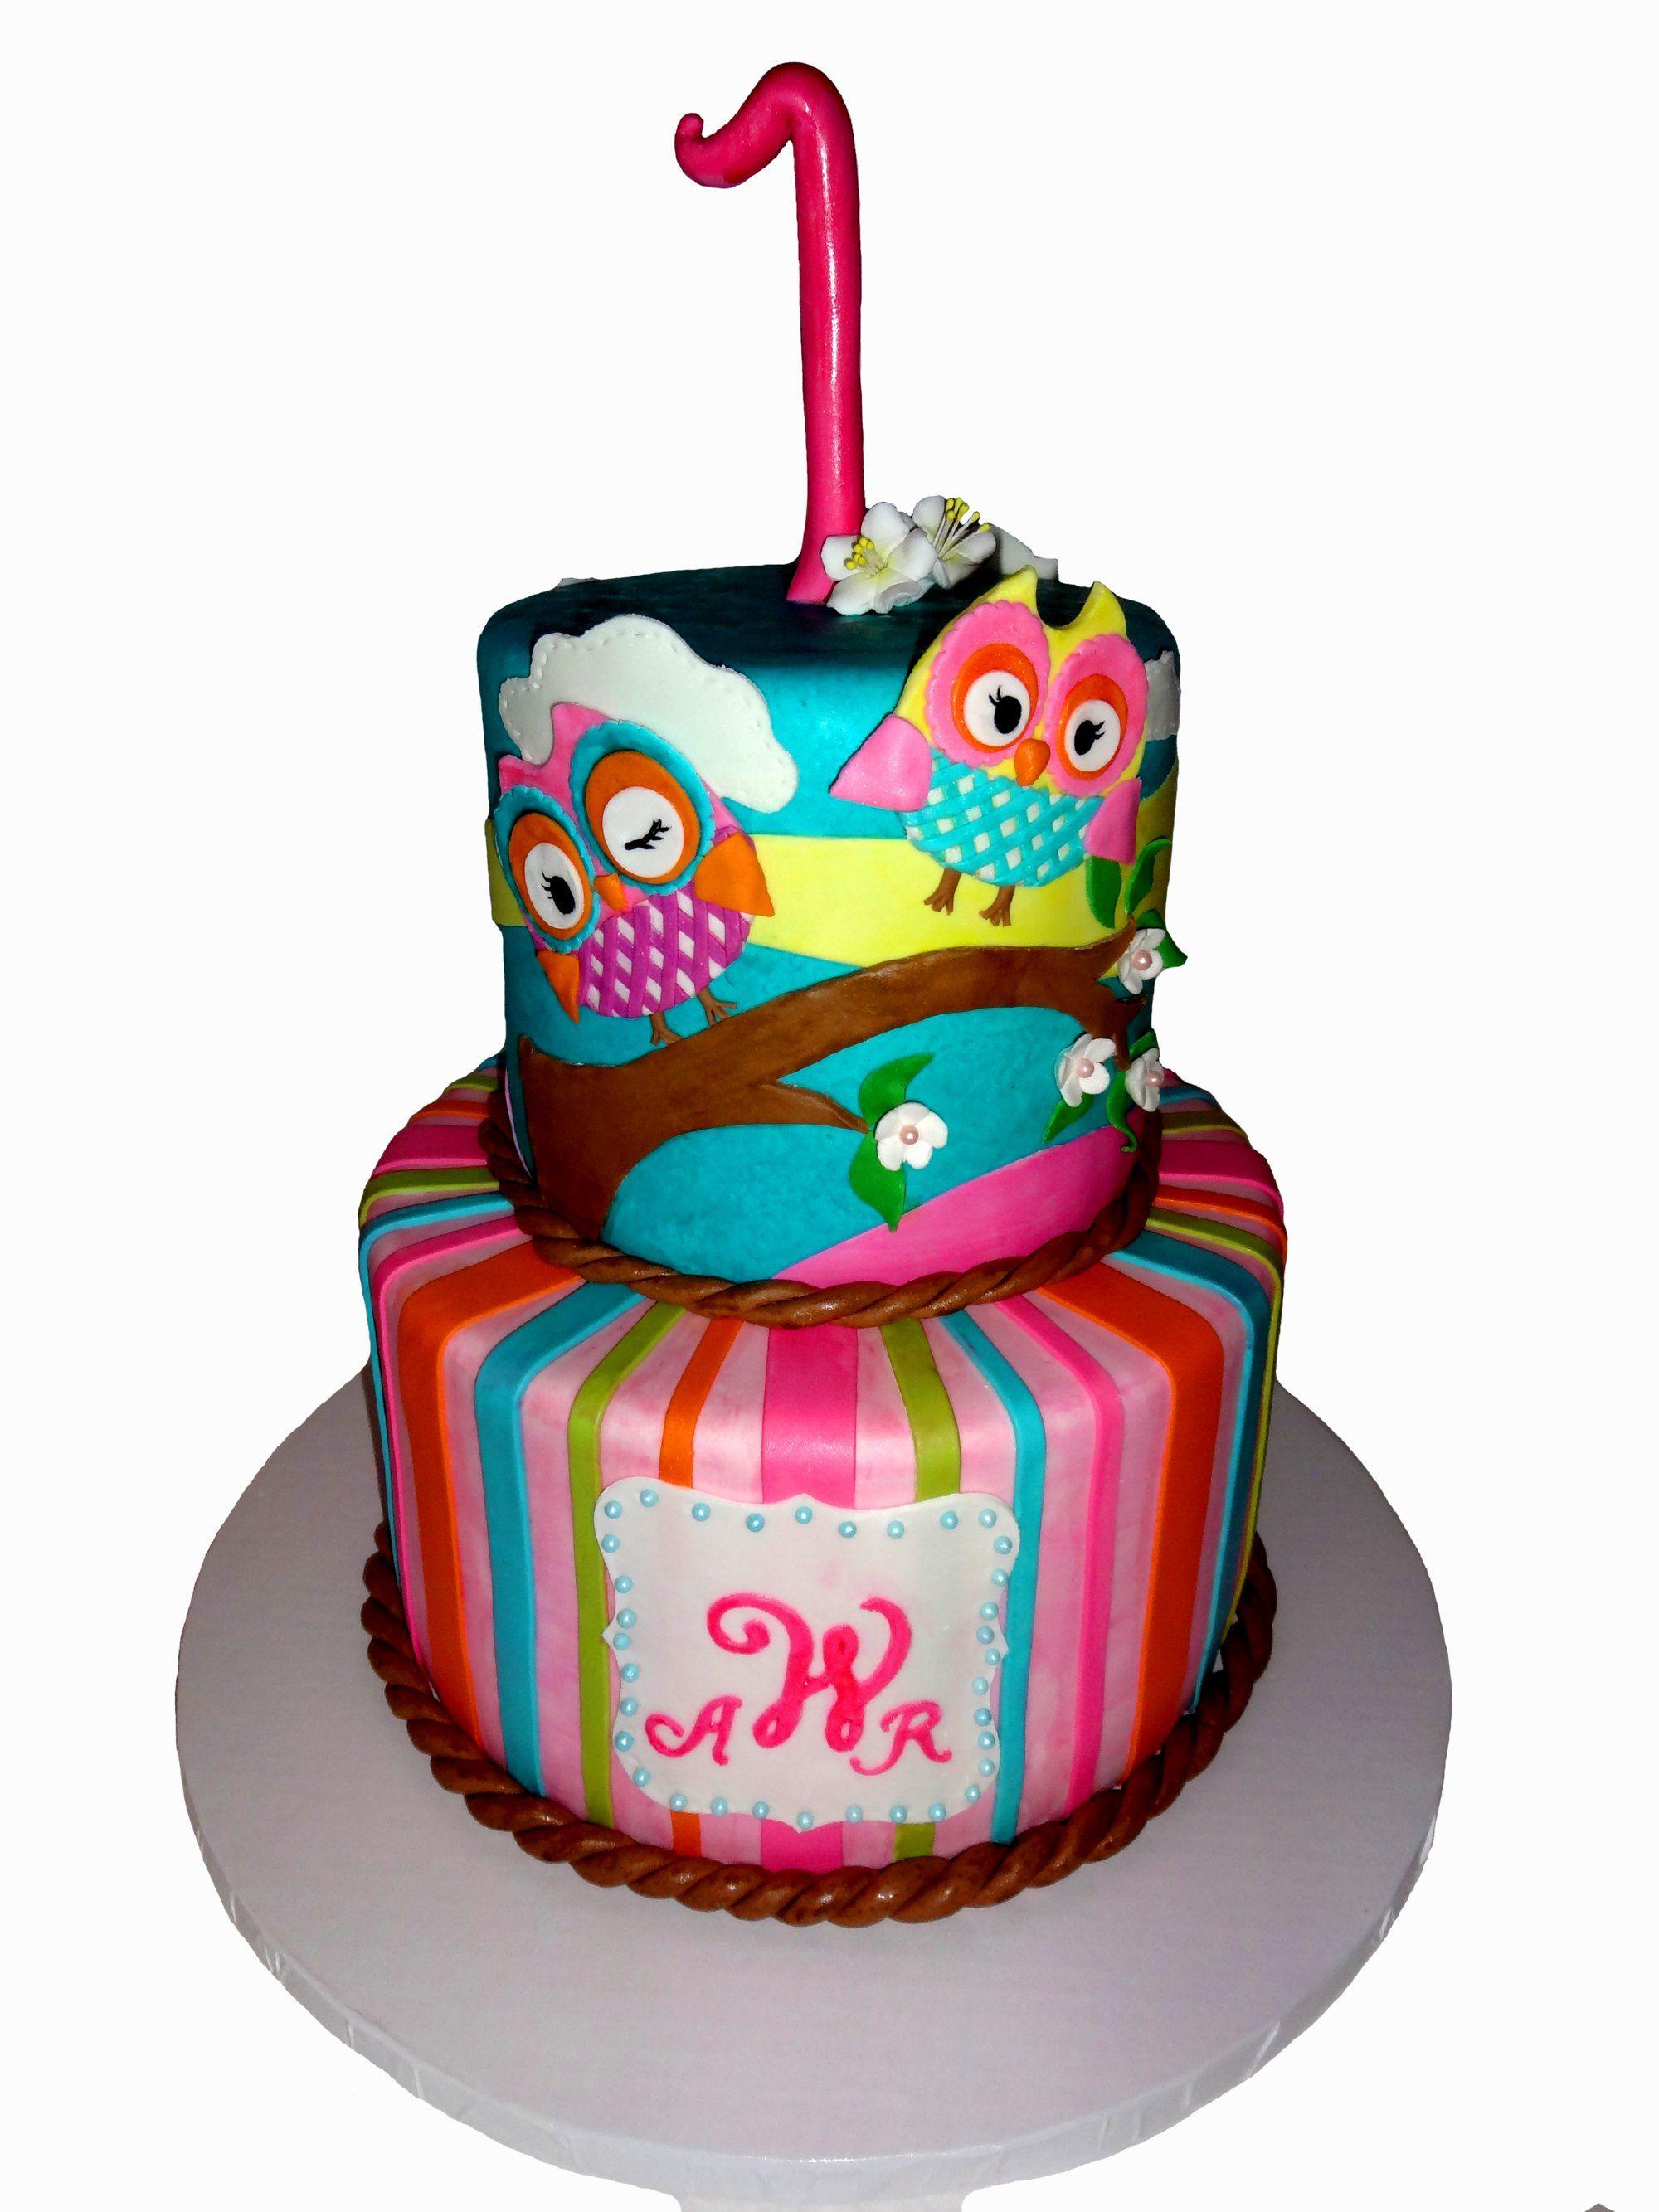 Owl 1st Birthday Cake Trishalicious Cakes Gainesville